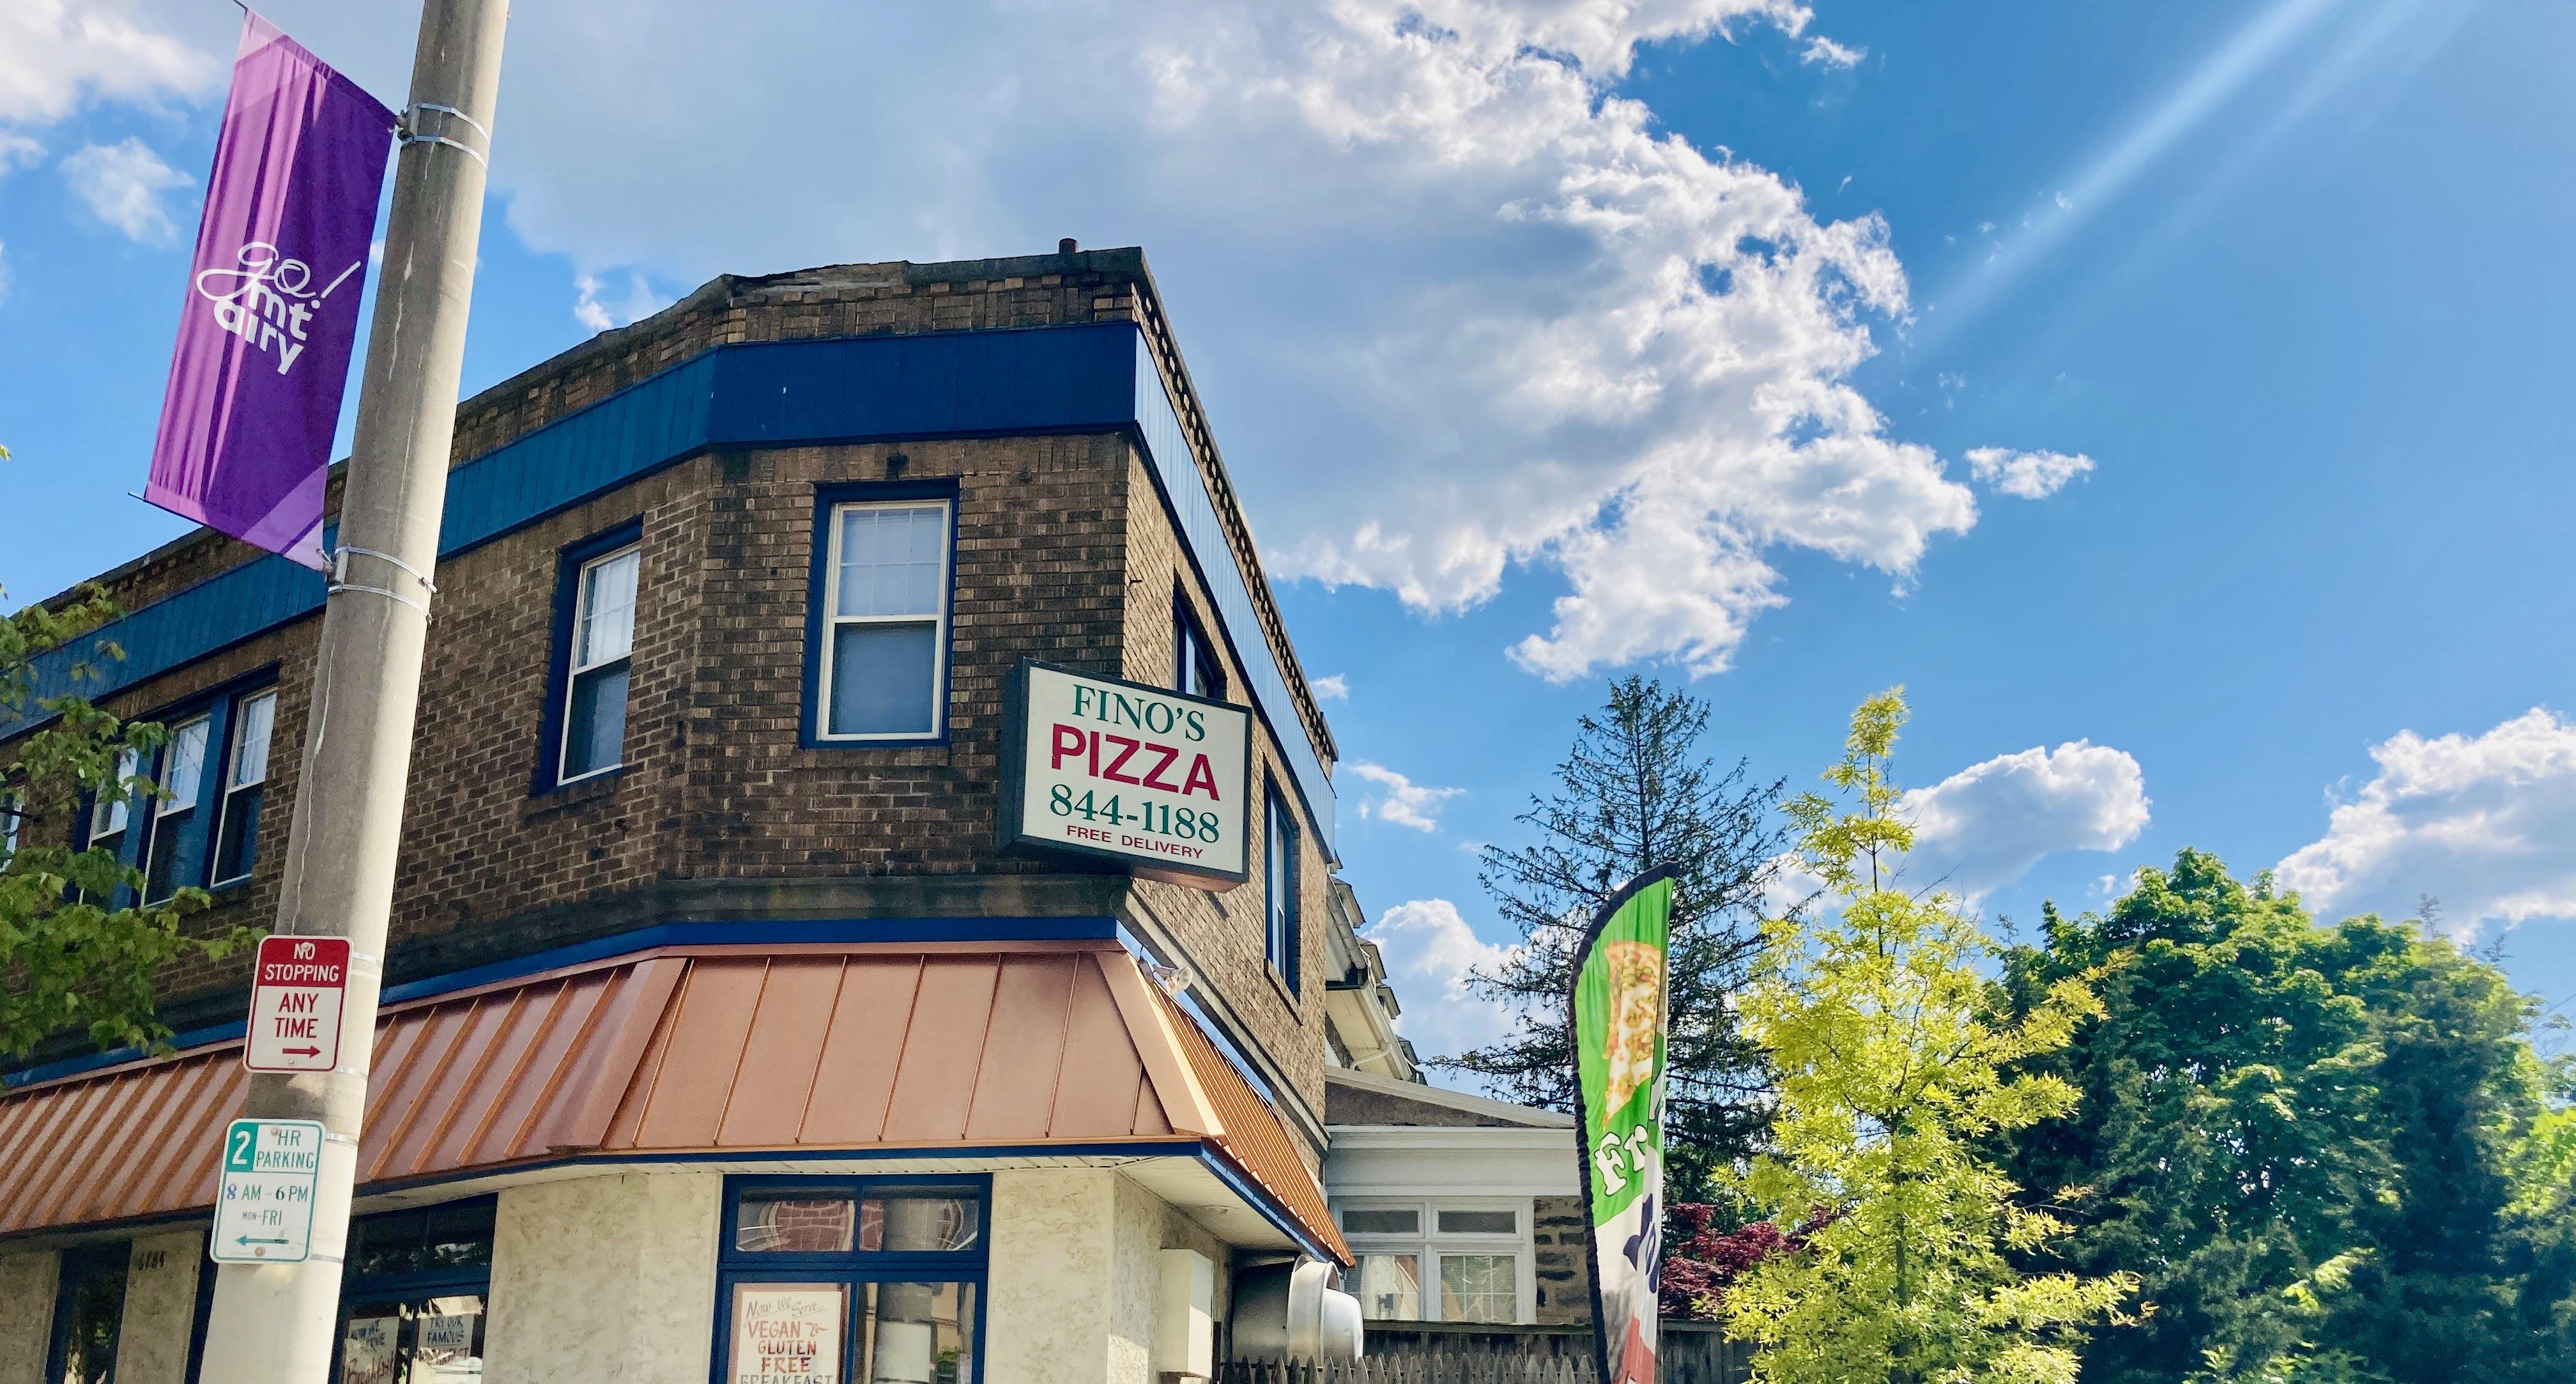 Fino's Pizza in Mount Airy